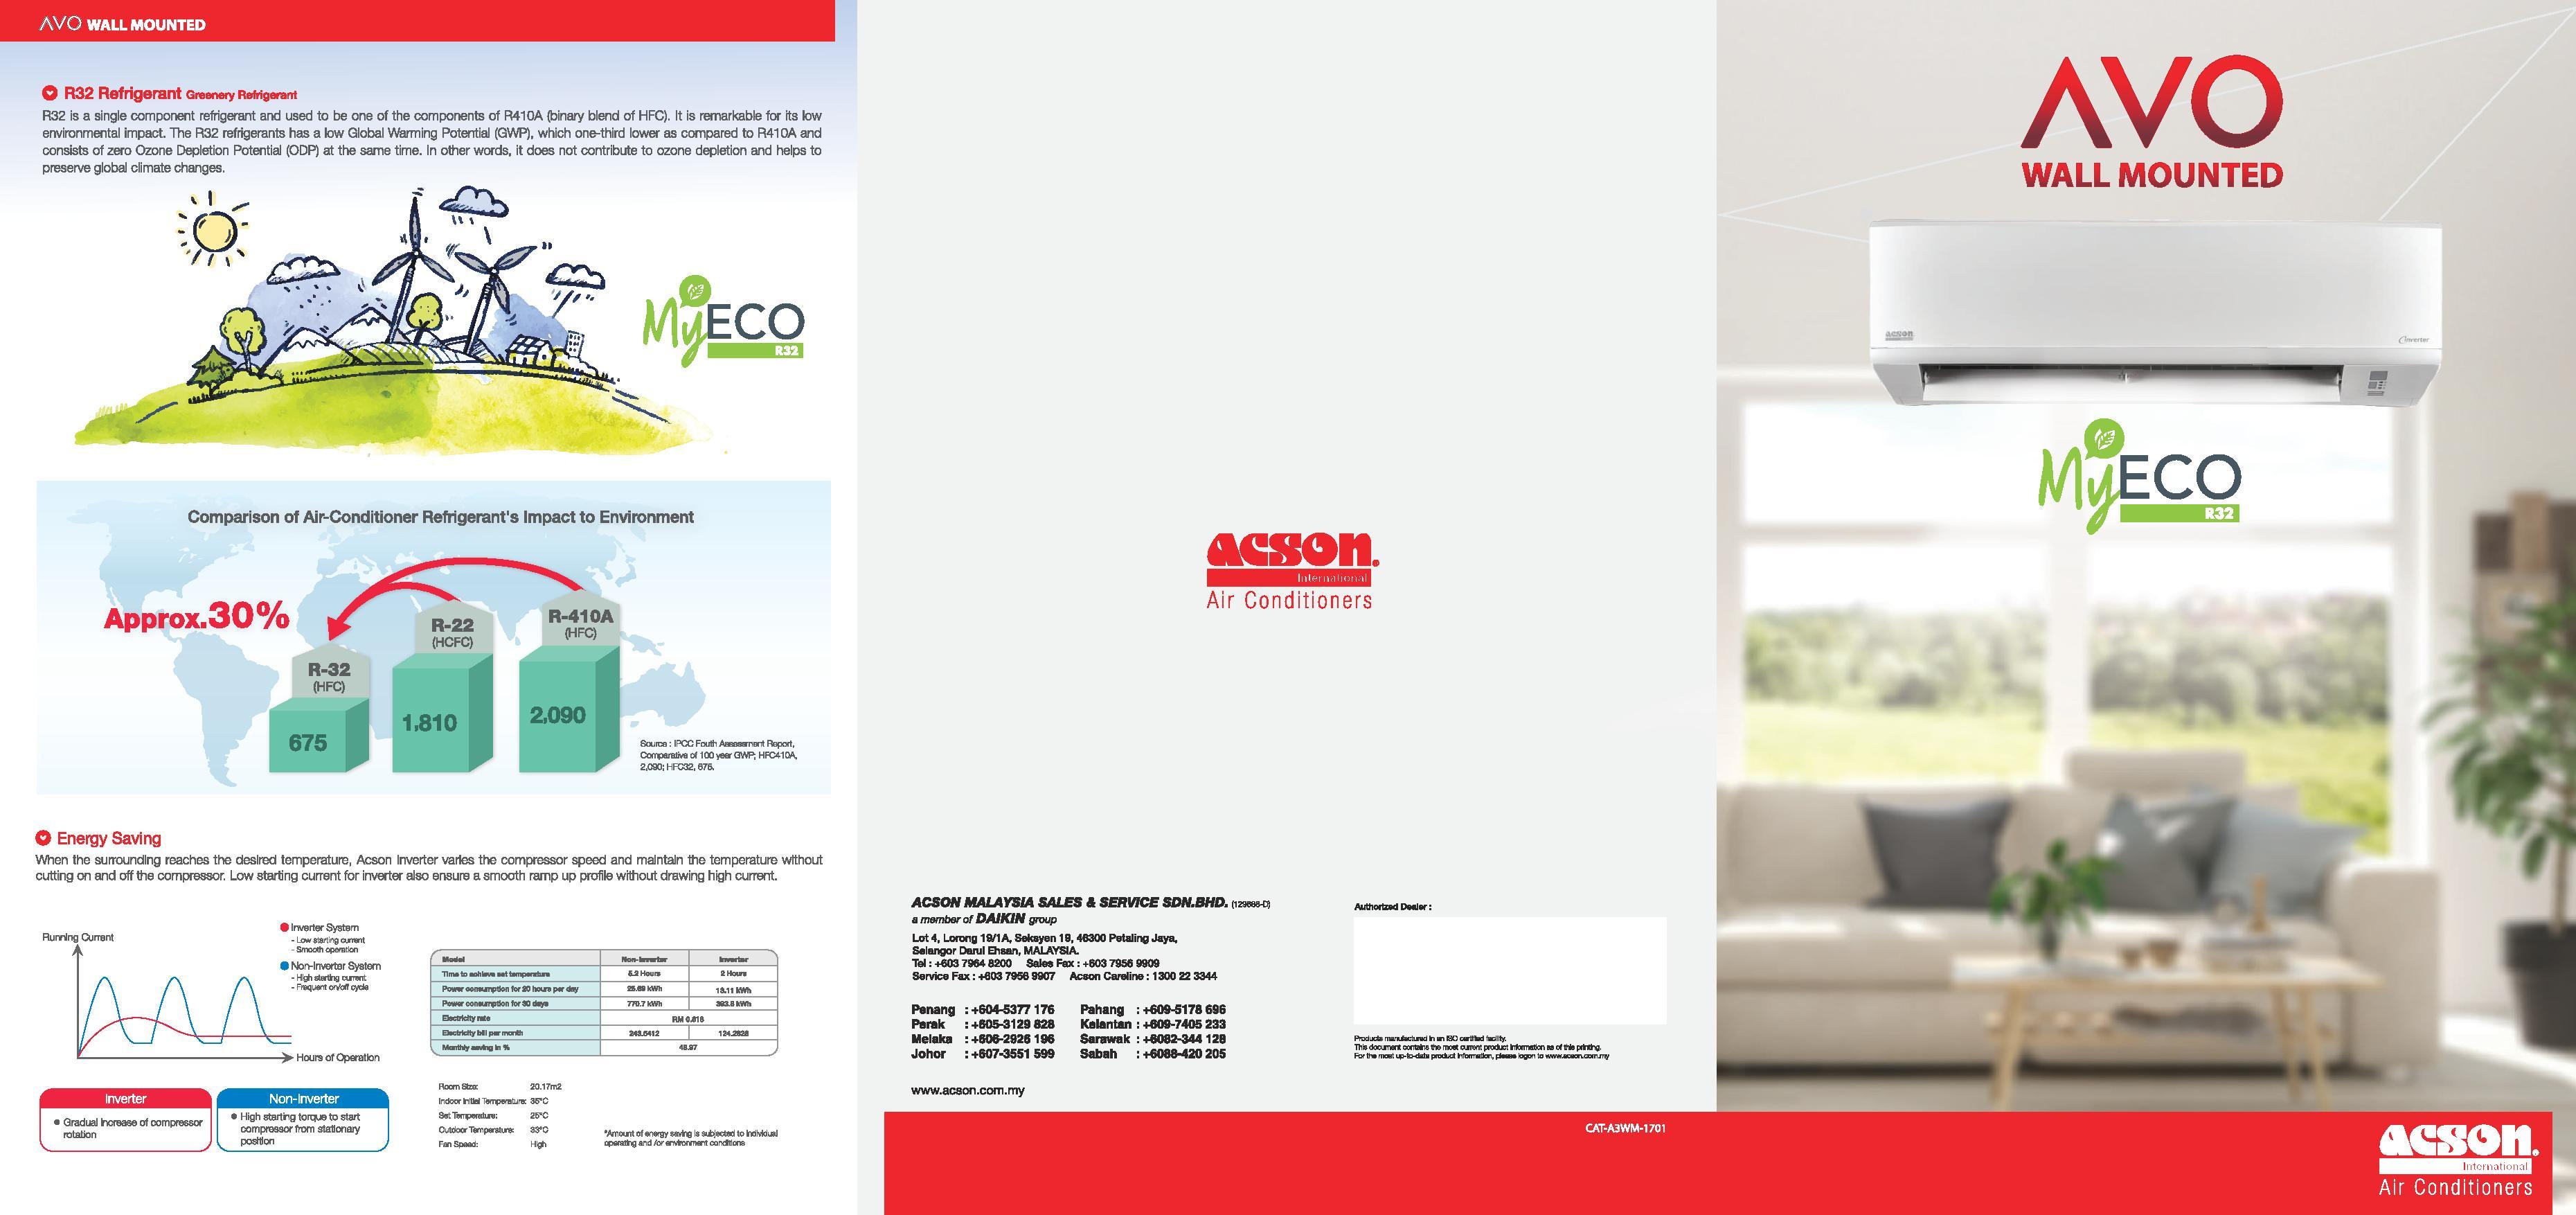 CAT-A3WM-1701-page-001[1]